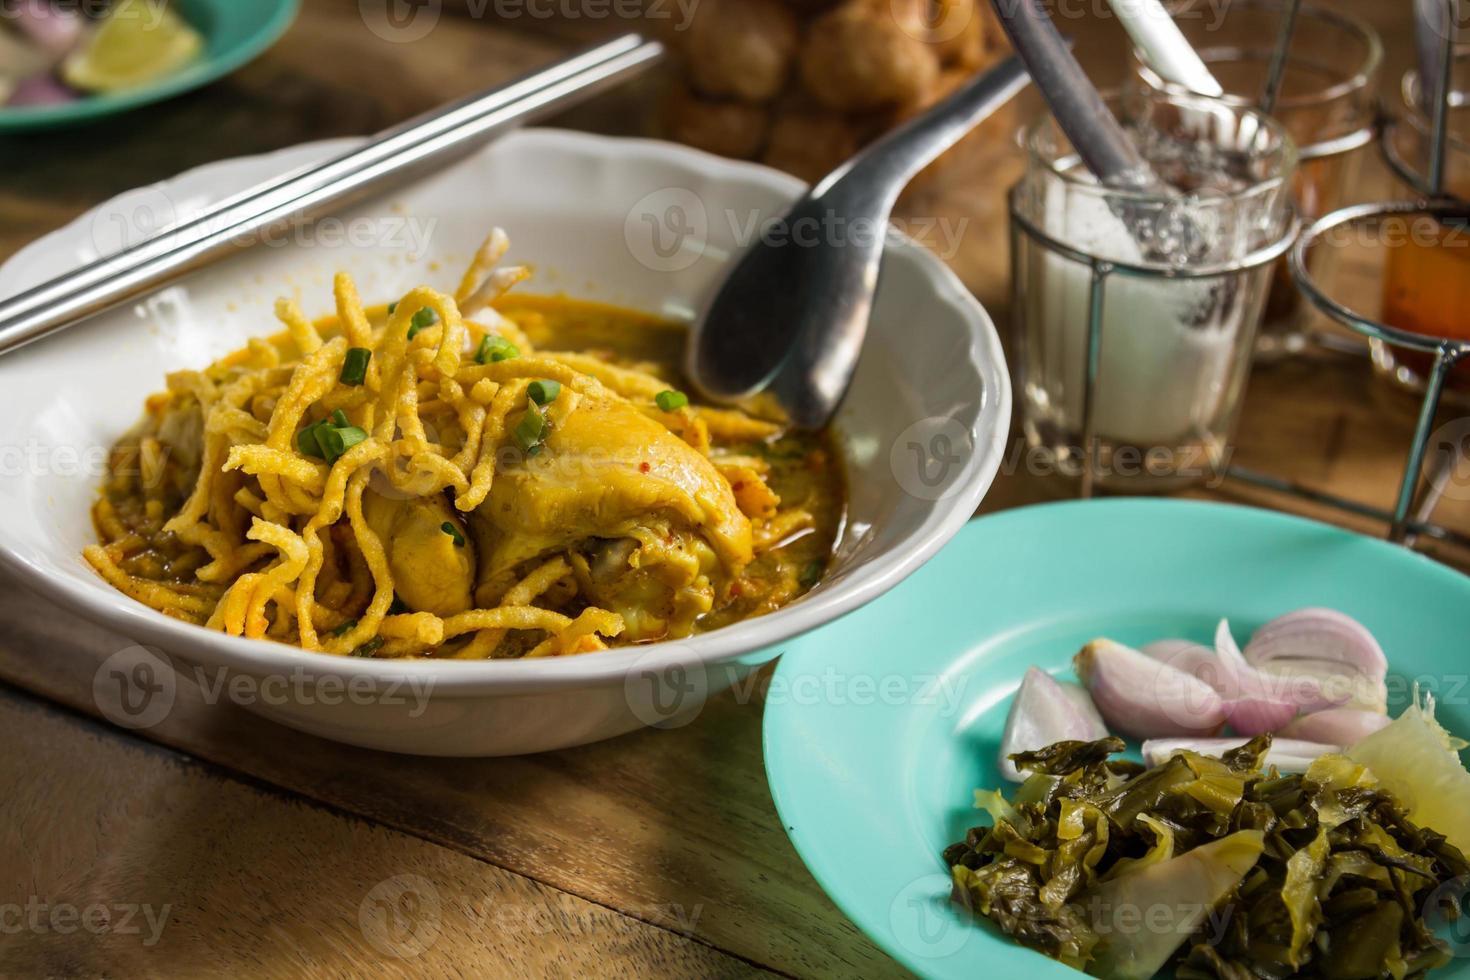 zuppa di curry di pasta tailandese settentrionale (khao soi) cucina tailandese settentrionale, foto